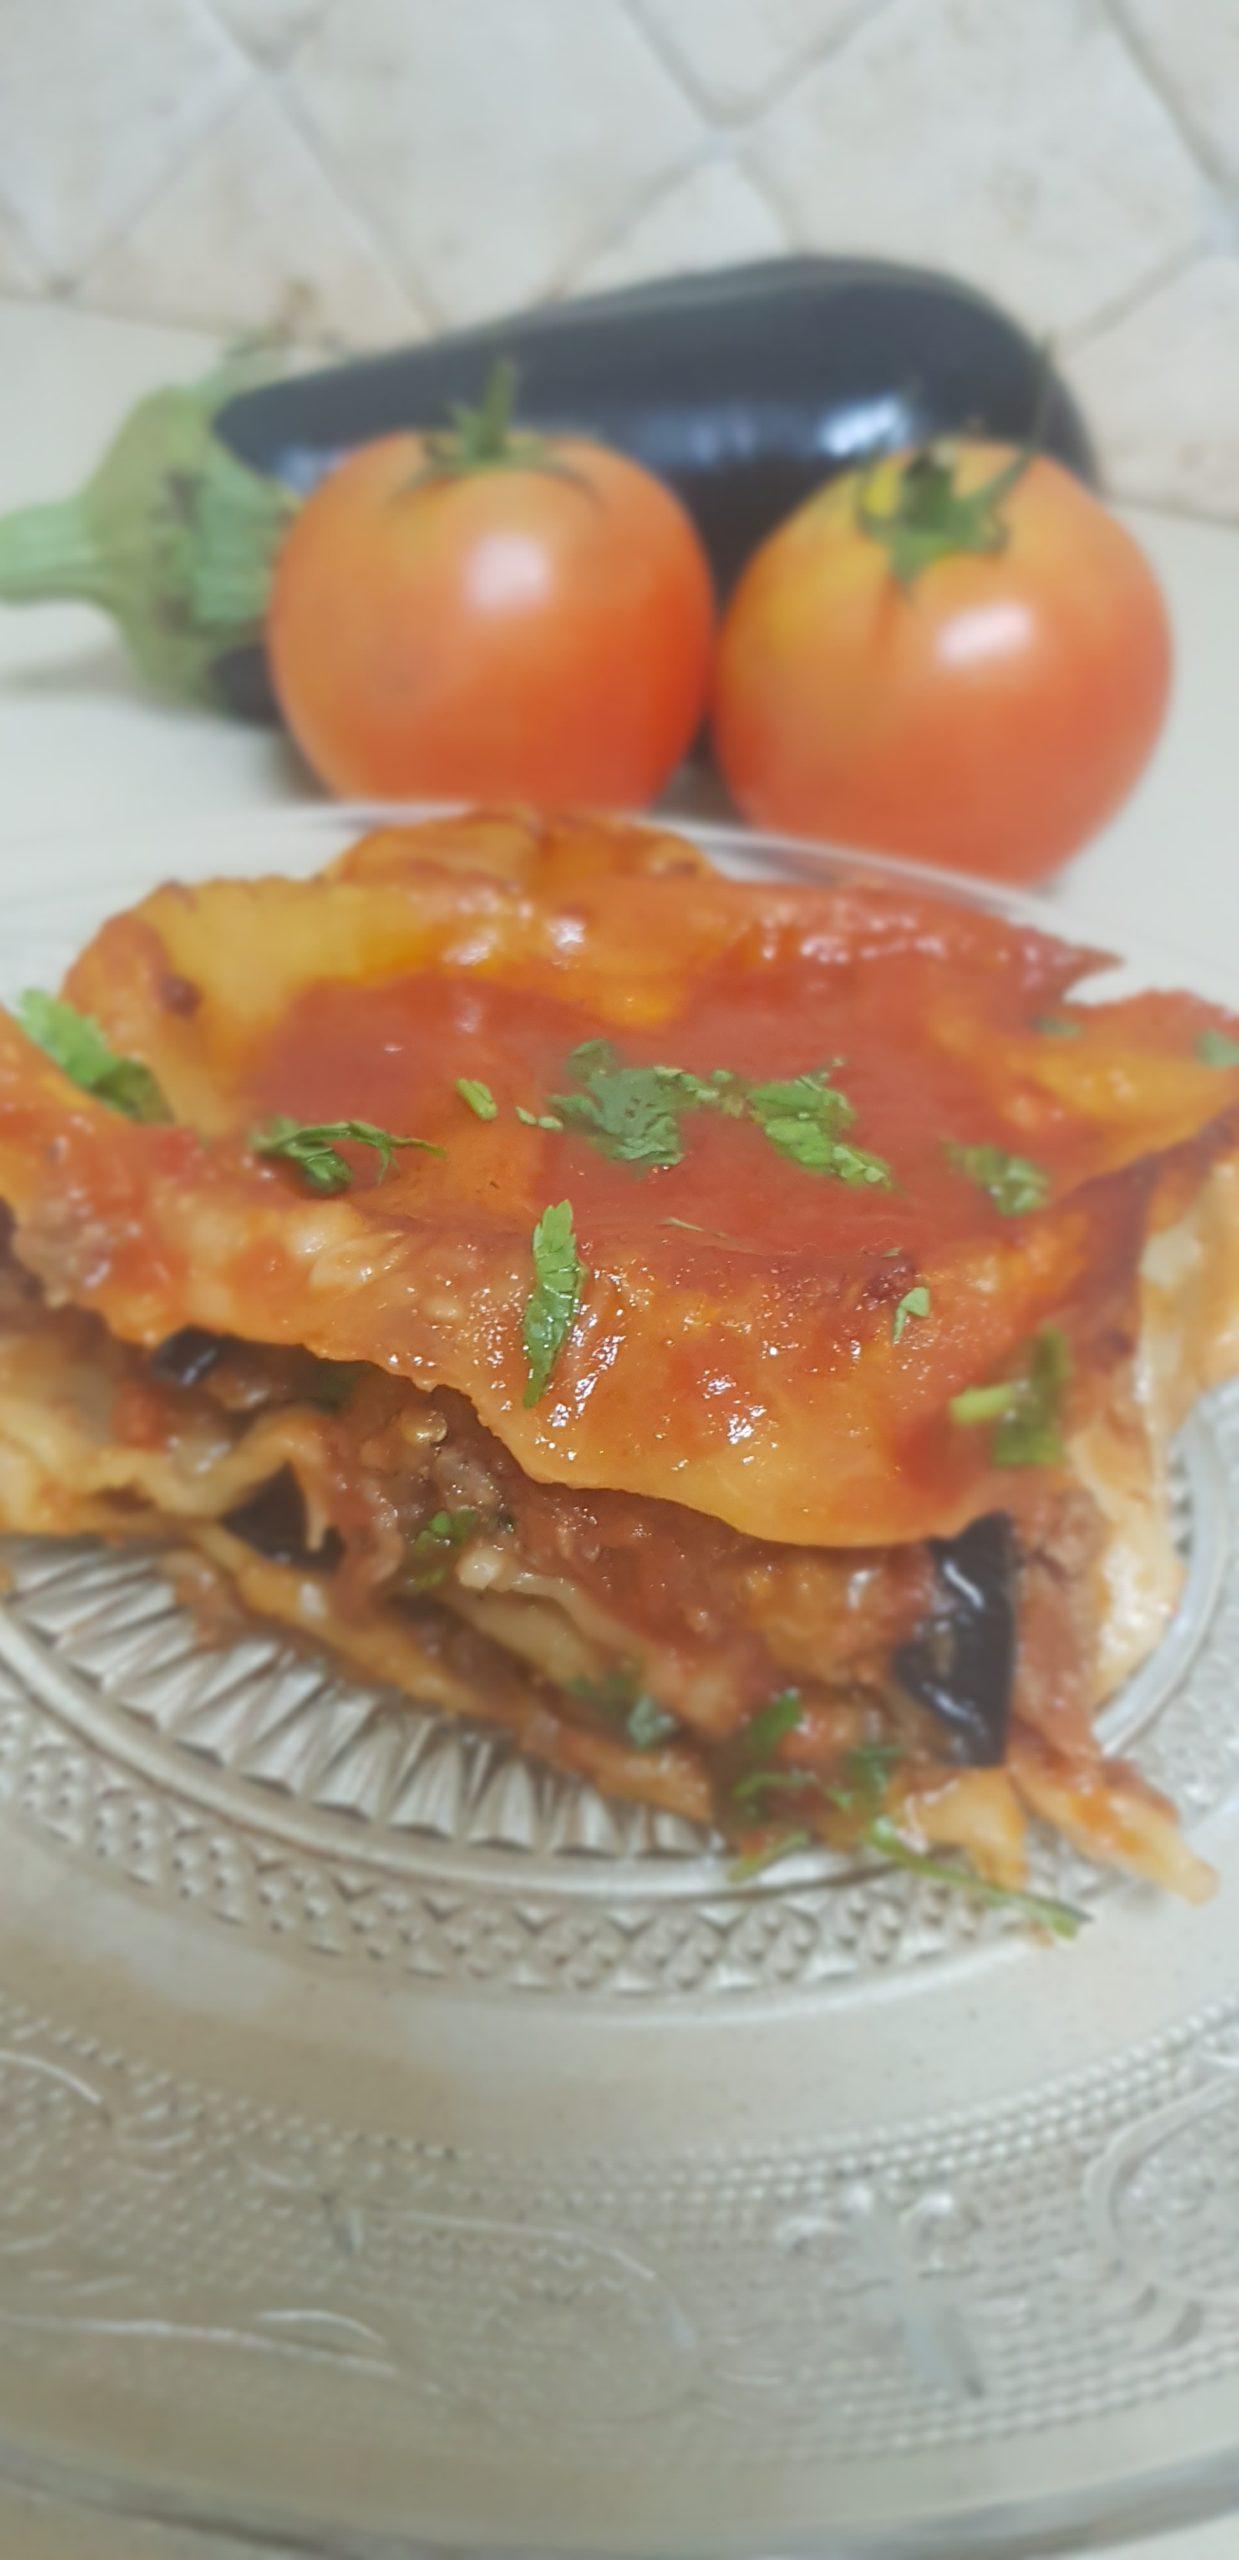 Les lasagnes aux aubergines, viande, tomates et coriandre